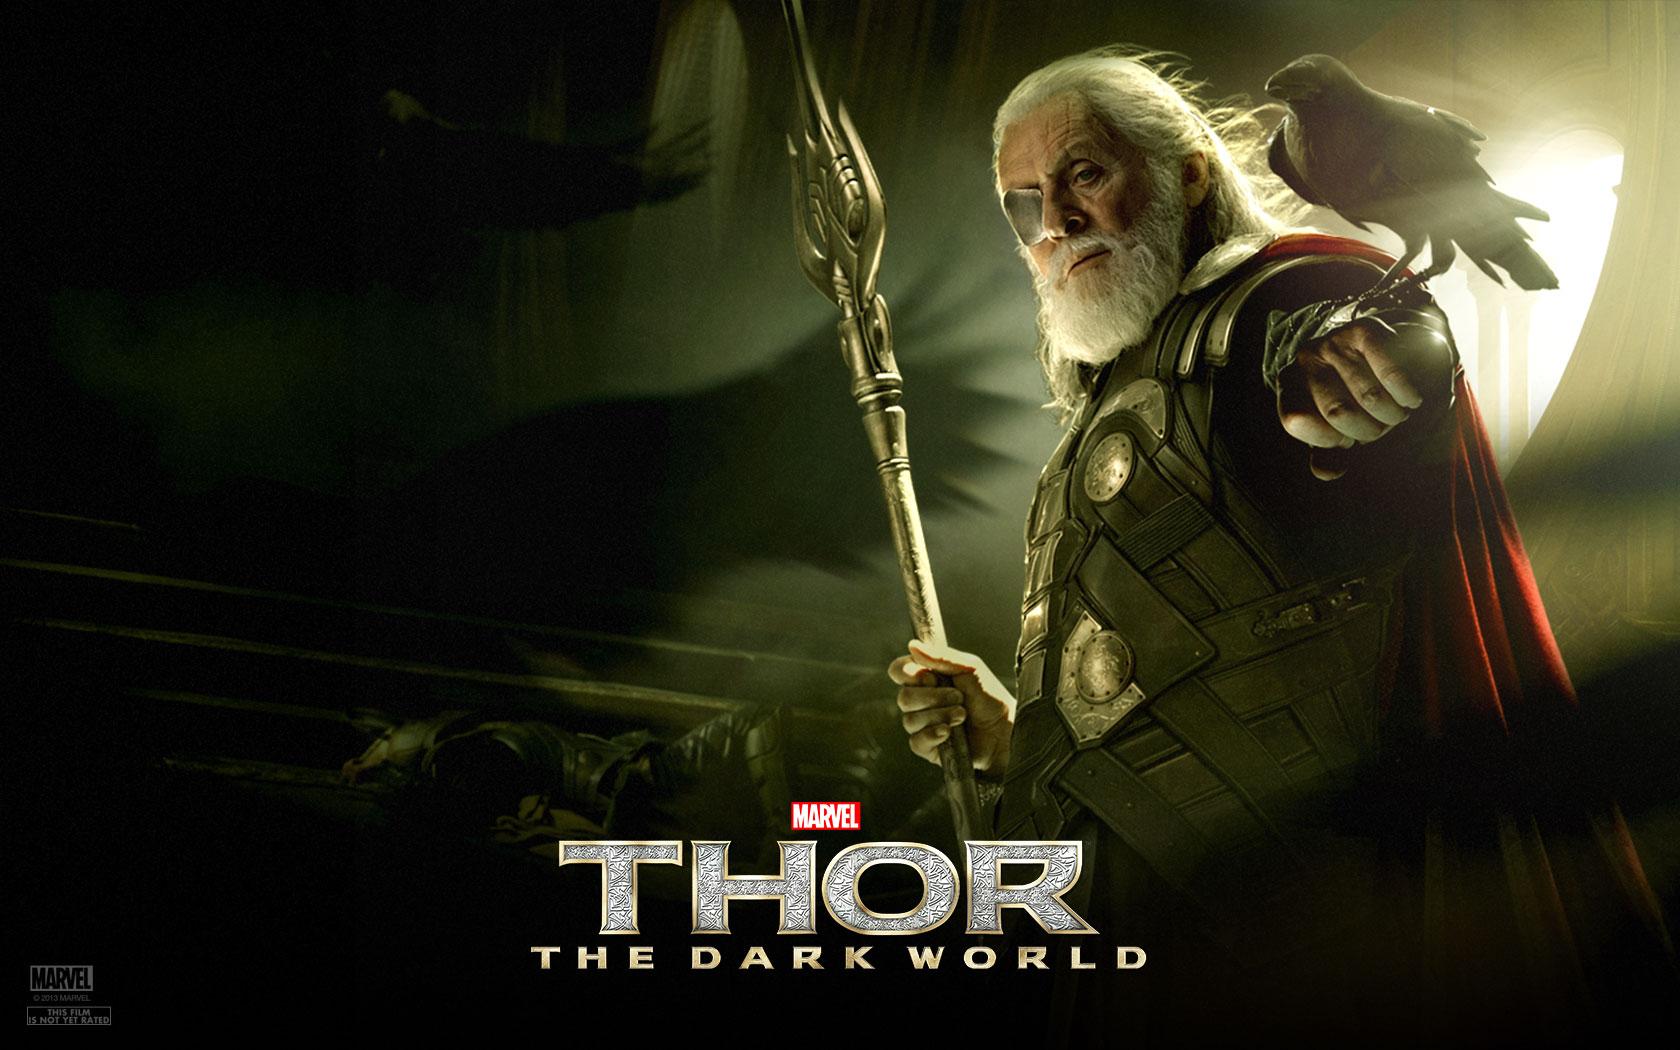 thor the dark world wallpaper 12 | wallpapersbq